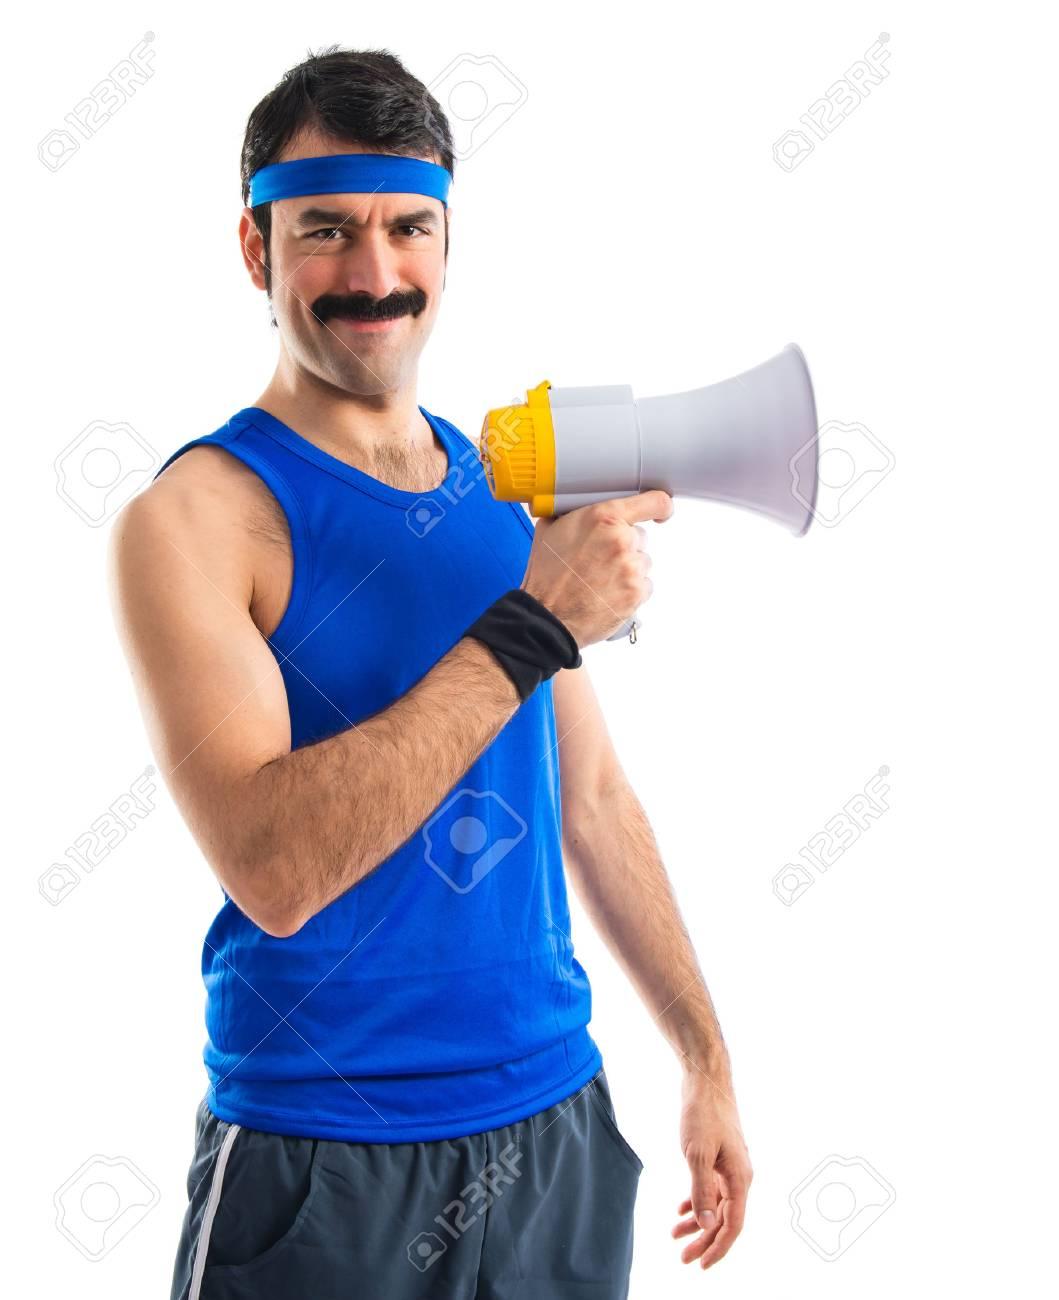 Sportman shouting by megaphone - 36559841